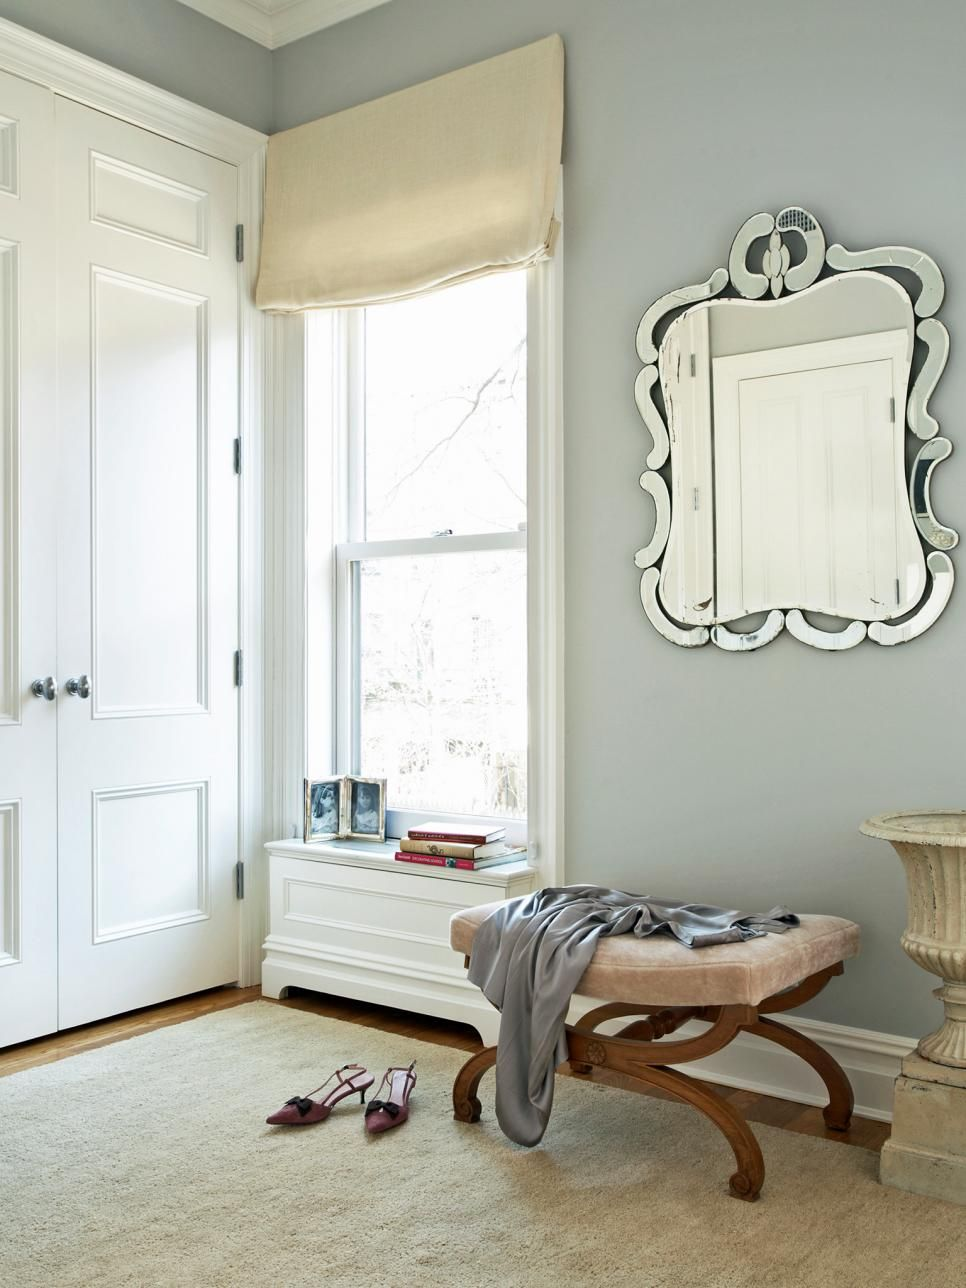 beautiful bedrooms 15 shades of gray decorating pinterest rh sk pinterest com